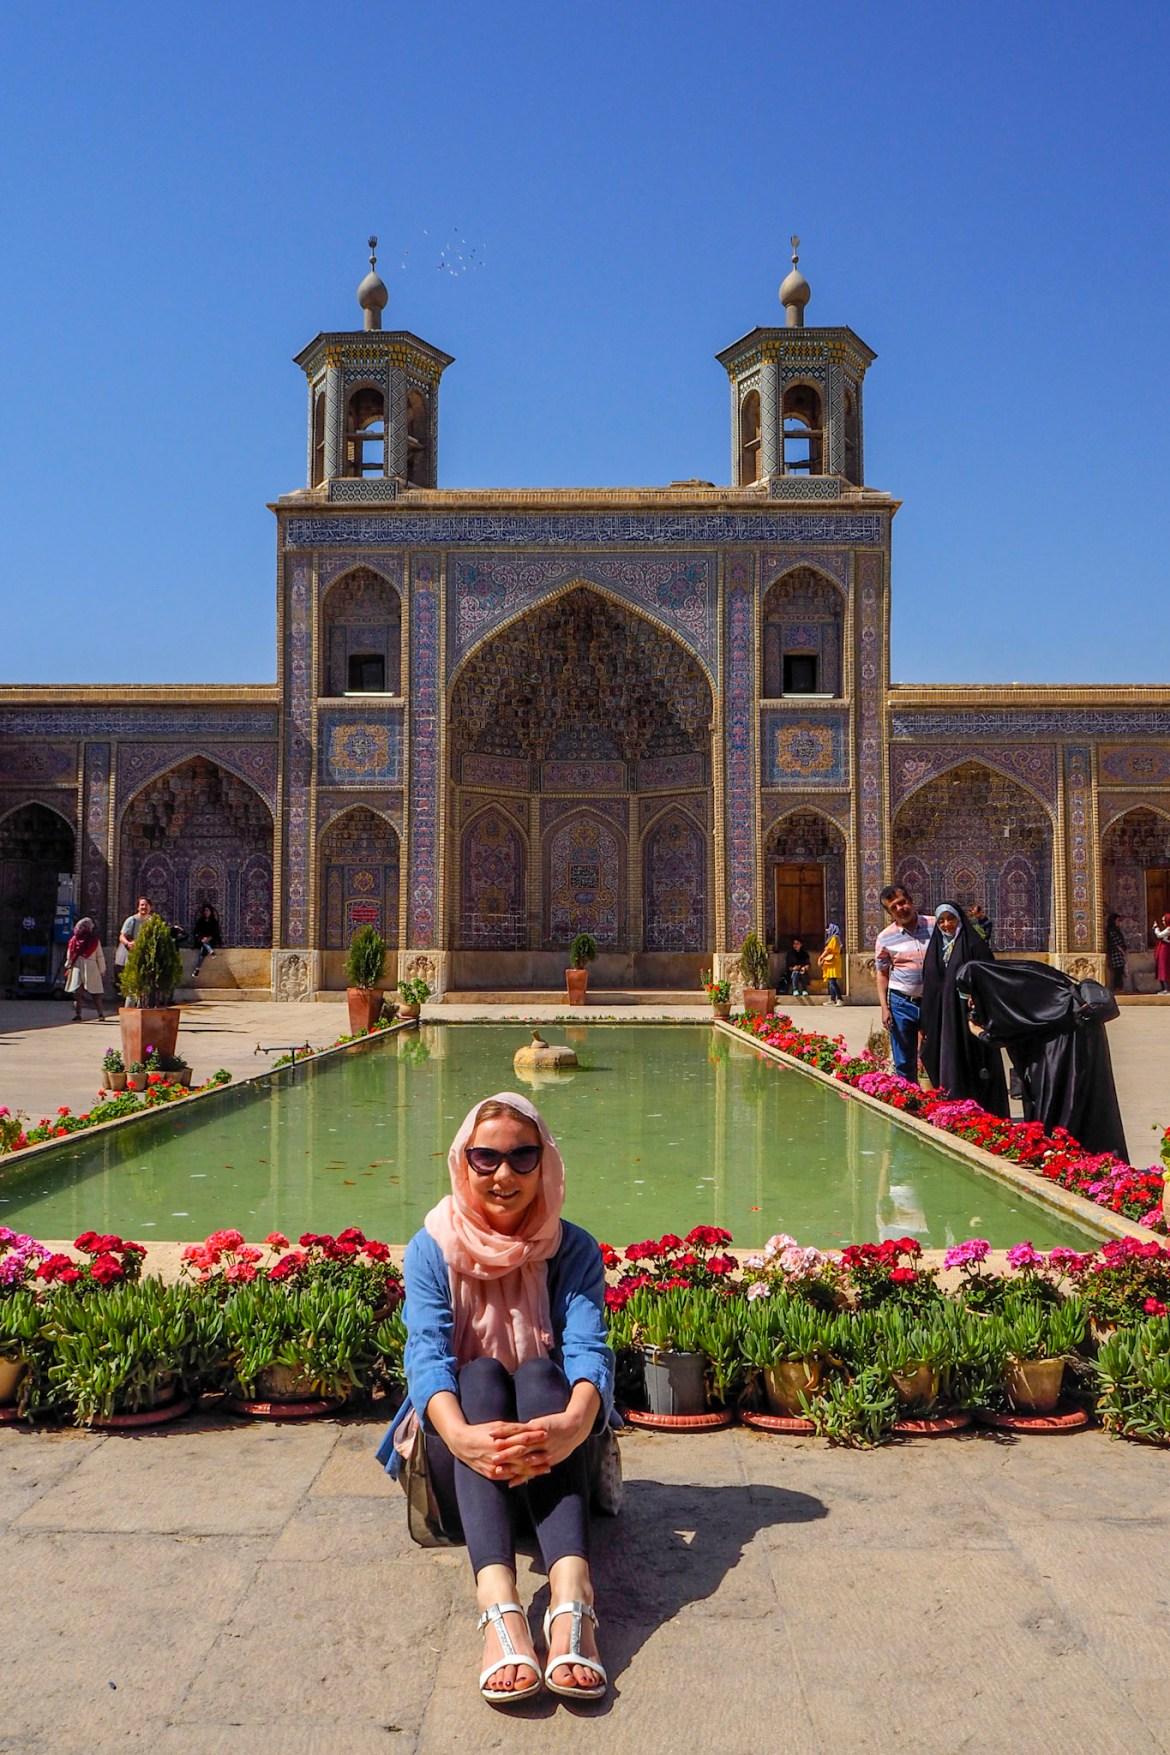 3290771 - Shiraz i Persepolis - klejnoty Iranu